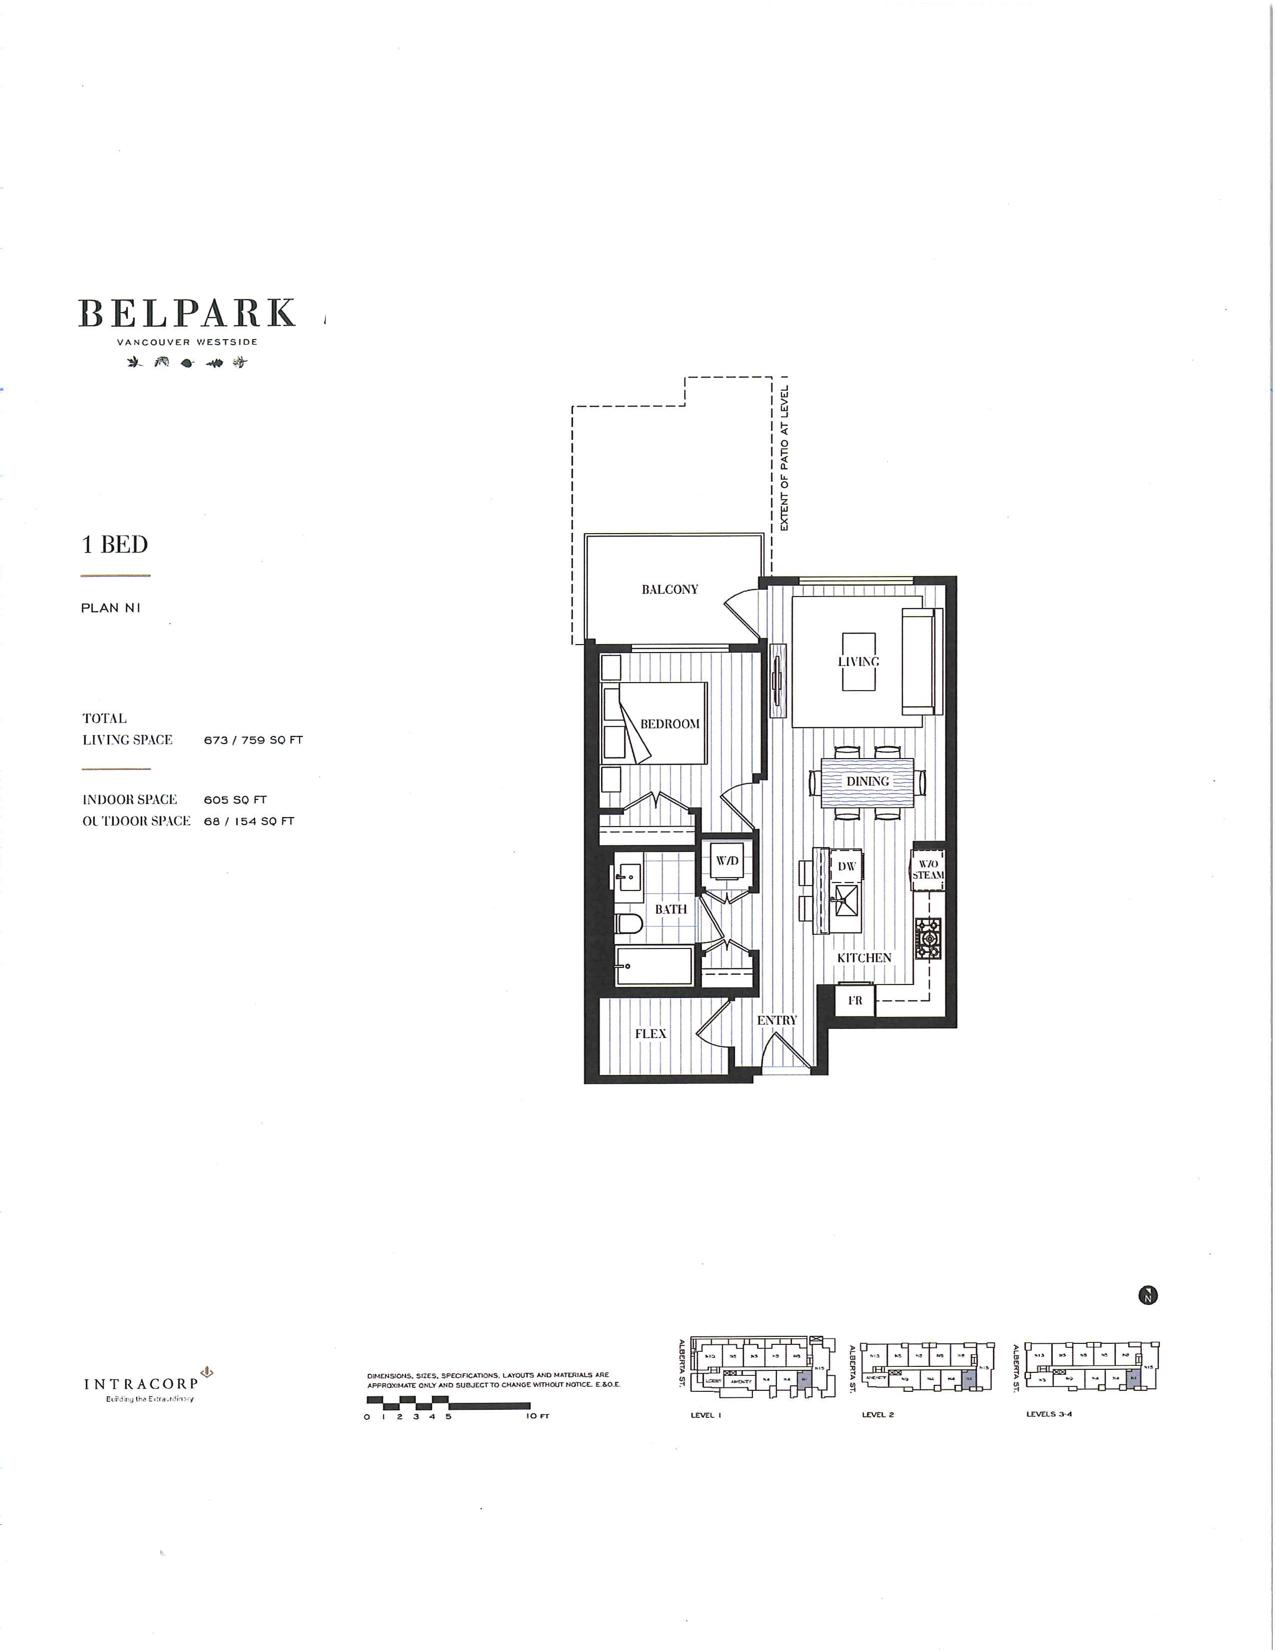 floor plan for Belpark modern 1 bedroom condo vancouver